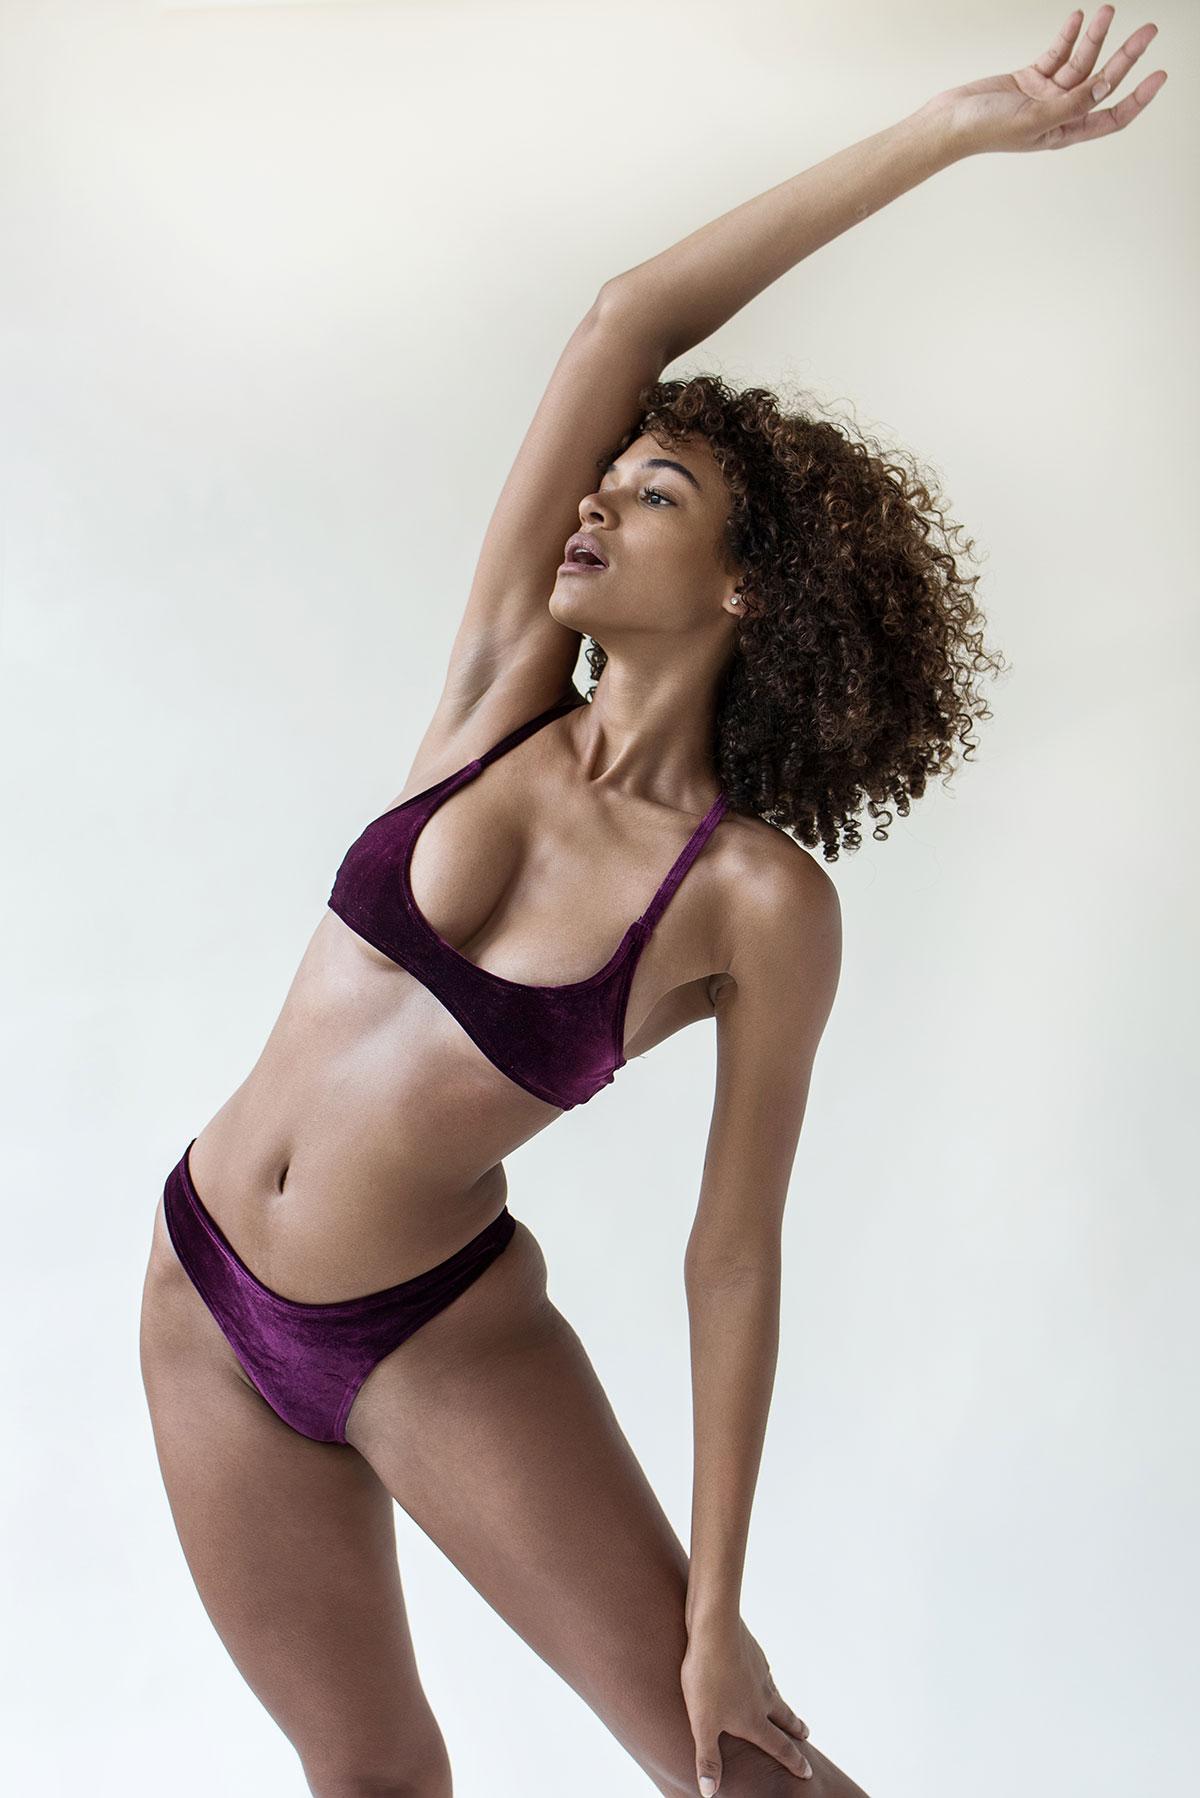 mirza-babic-fashion-photography-new-york-ny-nikon-high-fashion-product5.jpg